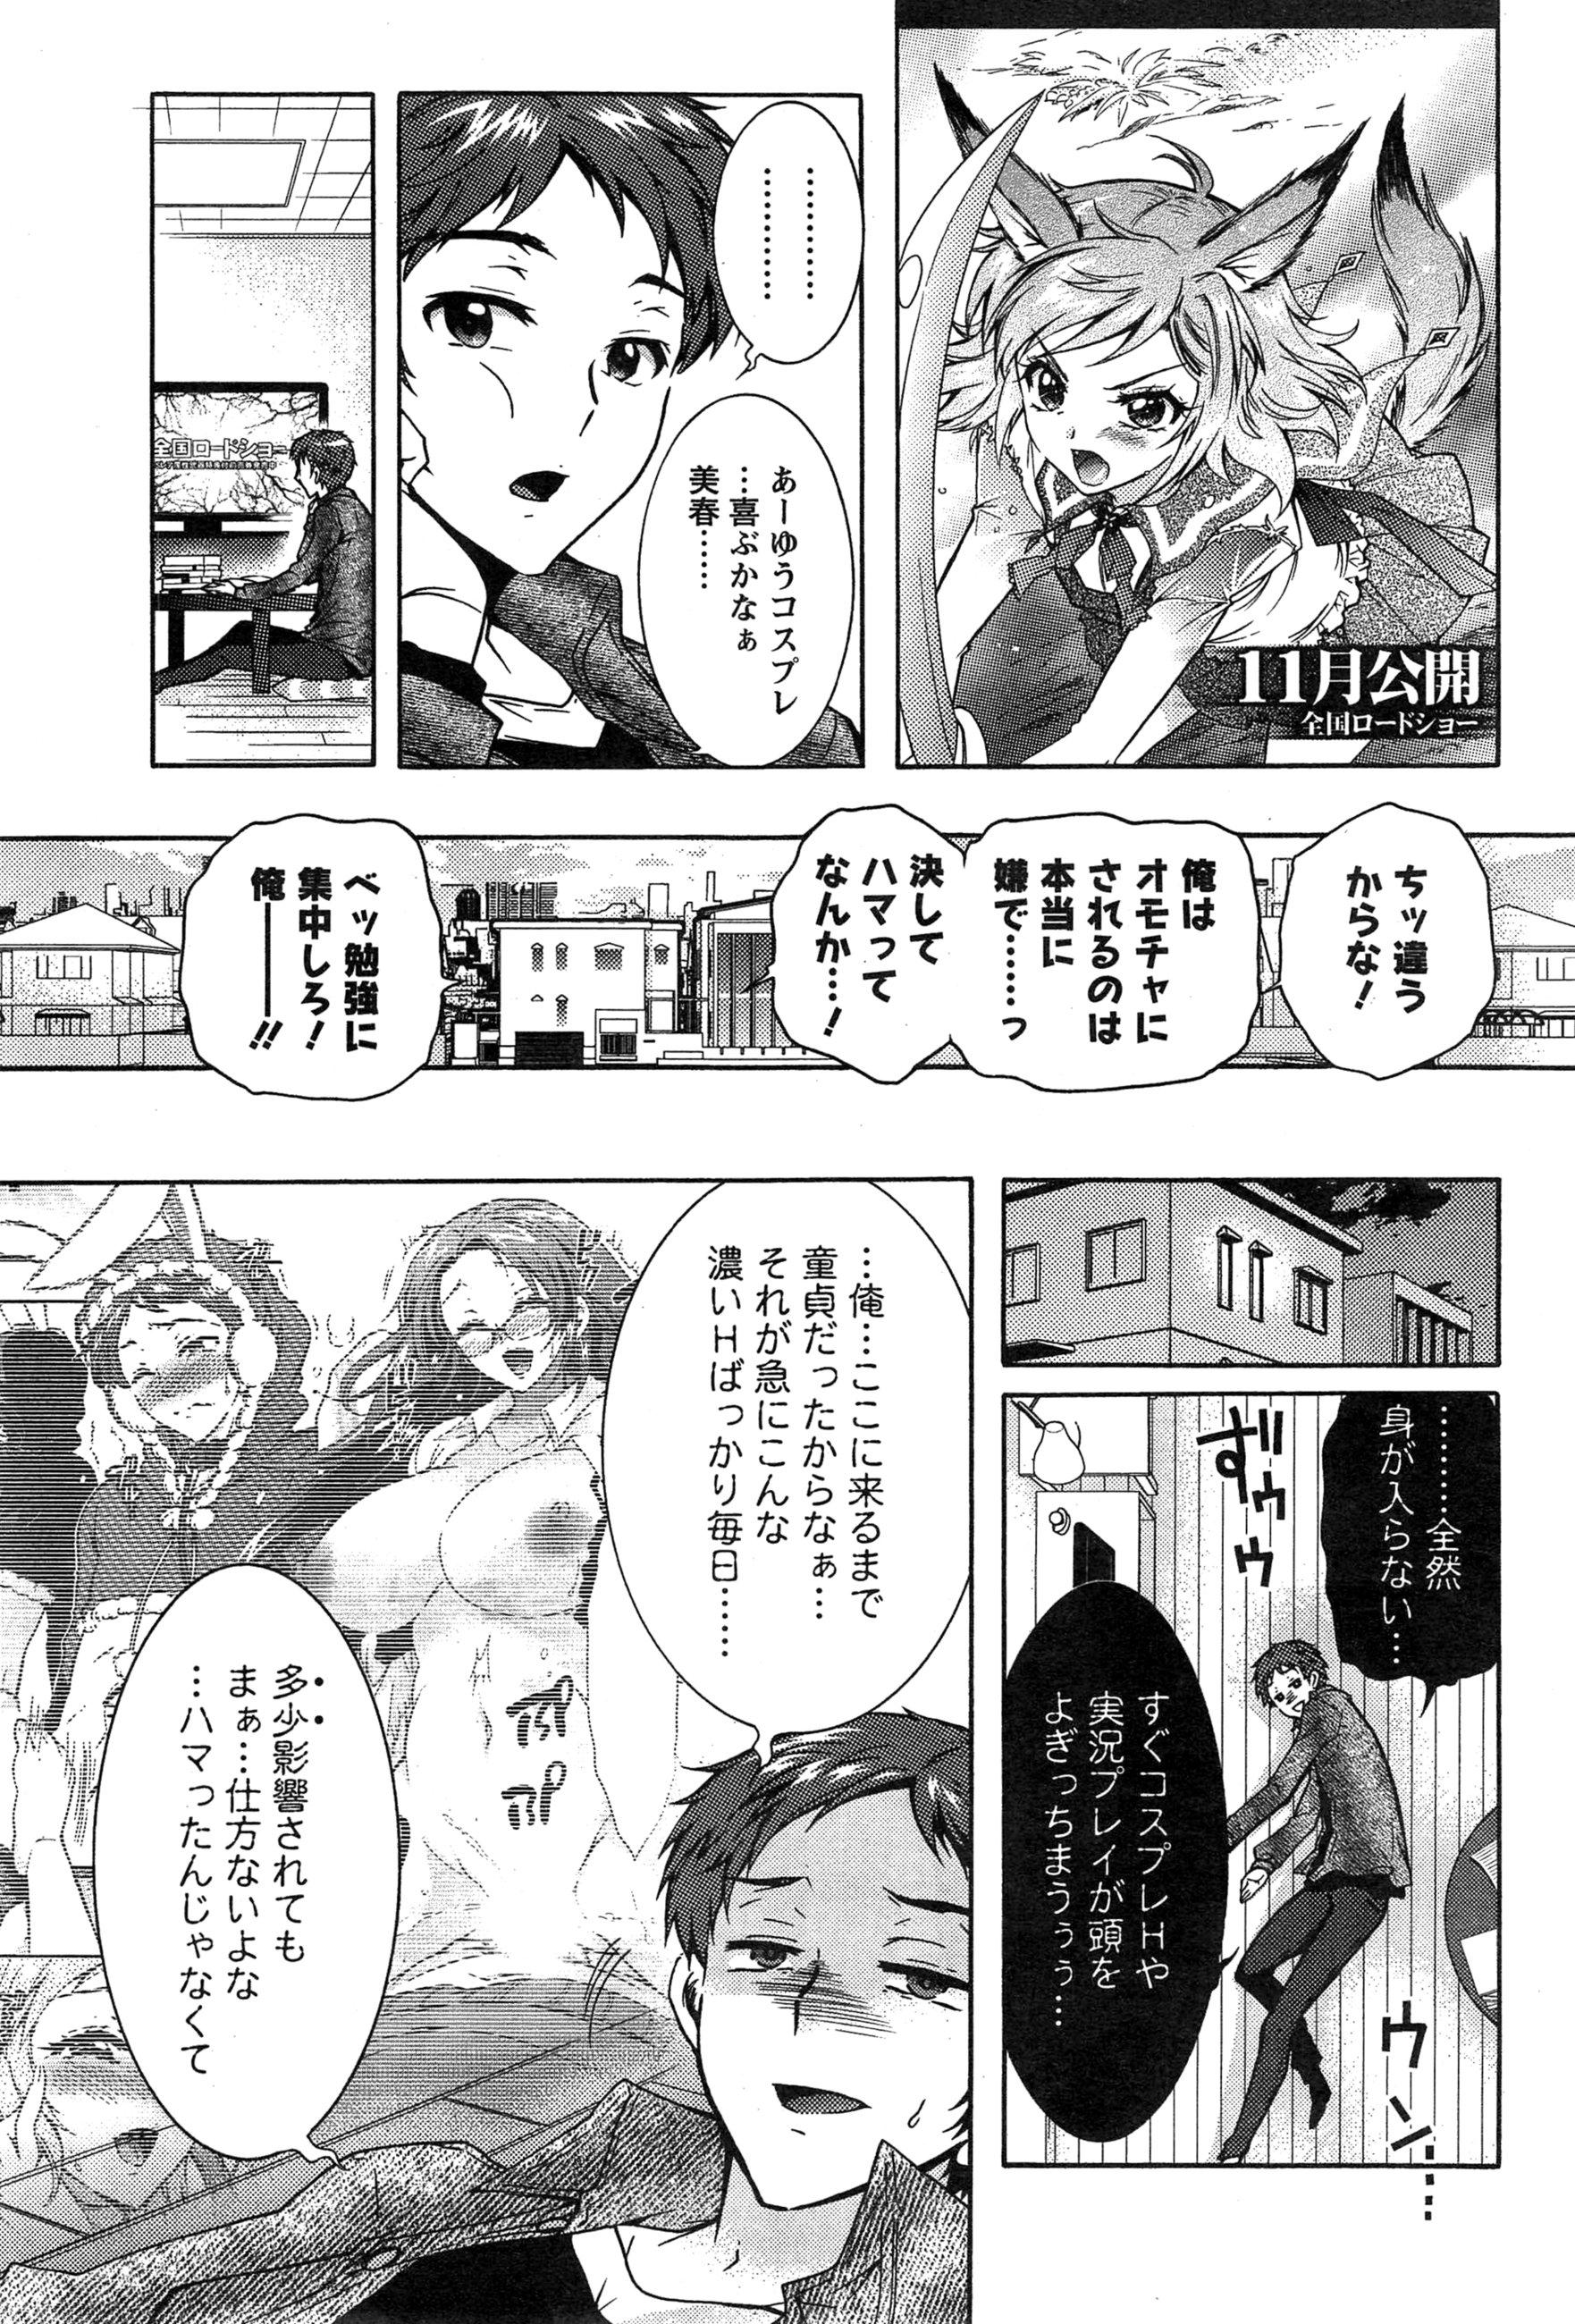 [Honda Arima] Sanshimai no Omocha - The Slave of Three Sisters Ch. 1-6 43